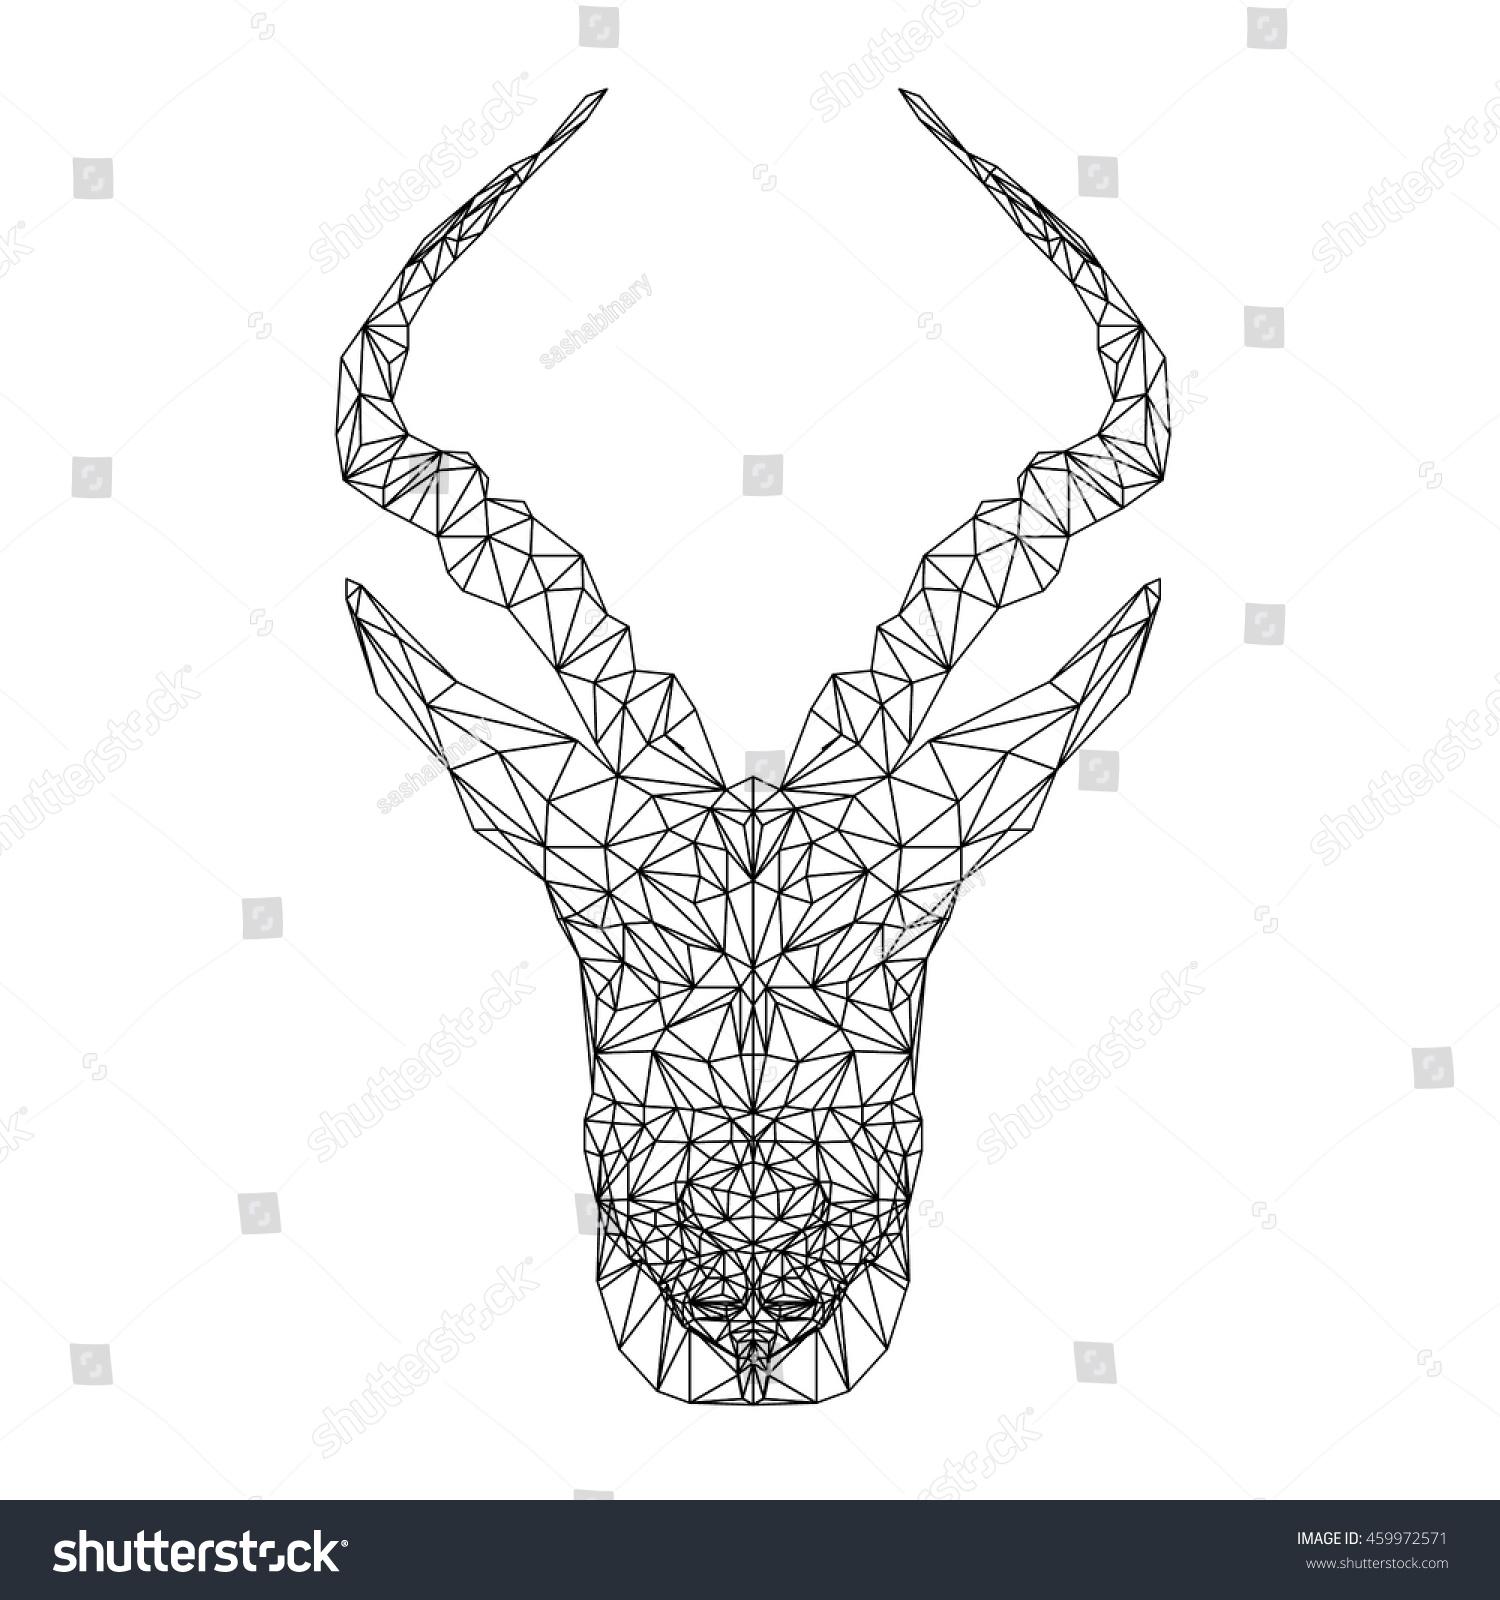 springbok african animal vector antelope illustration stock vector 459972571 shutterstock. Black Bedroom Furniture Sets. Home Design Ideas